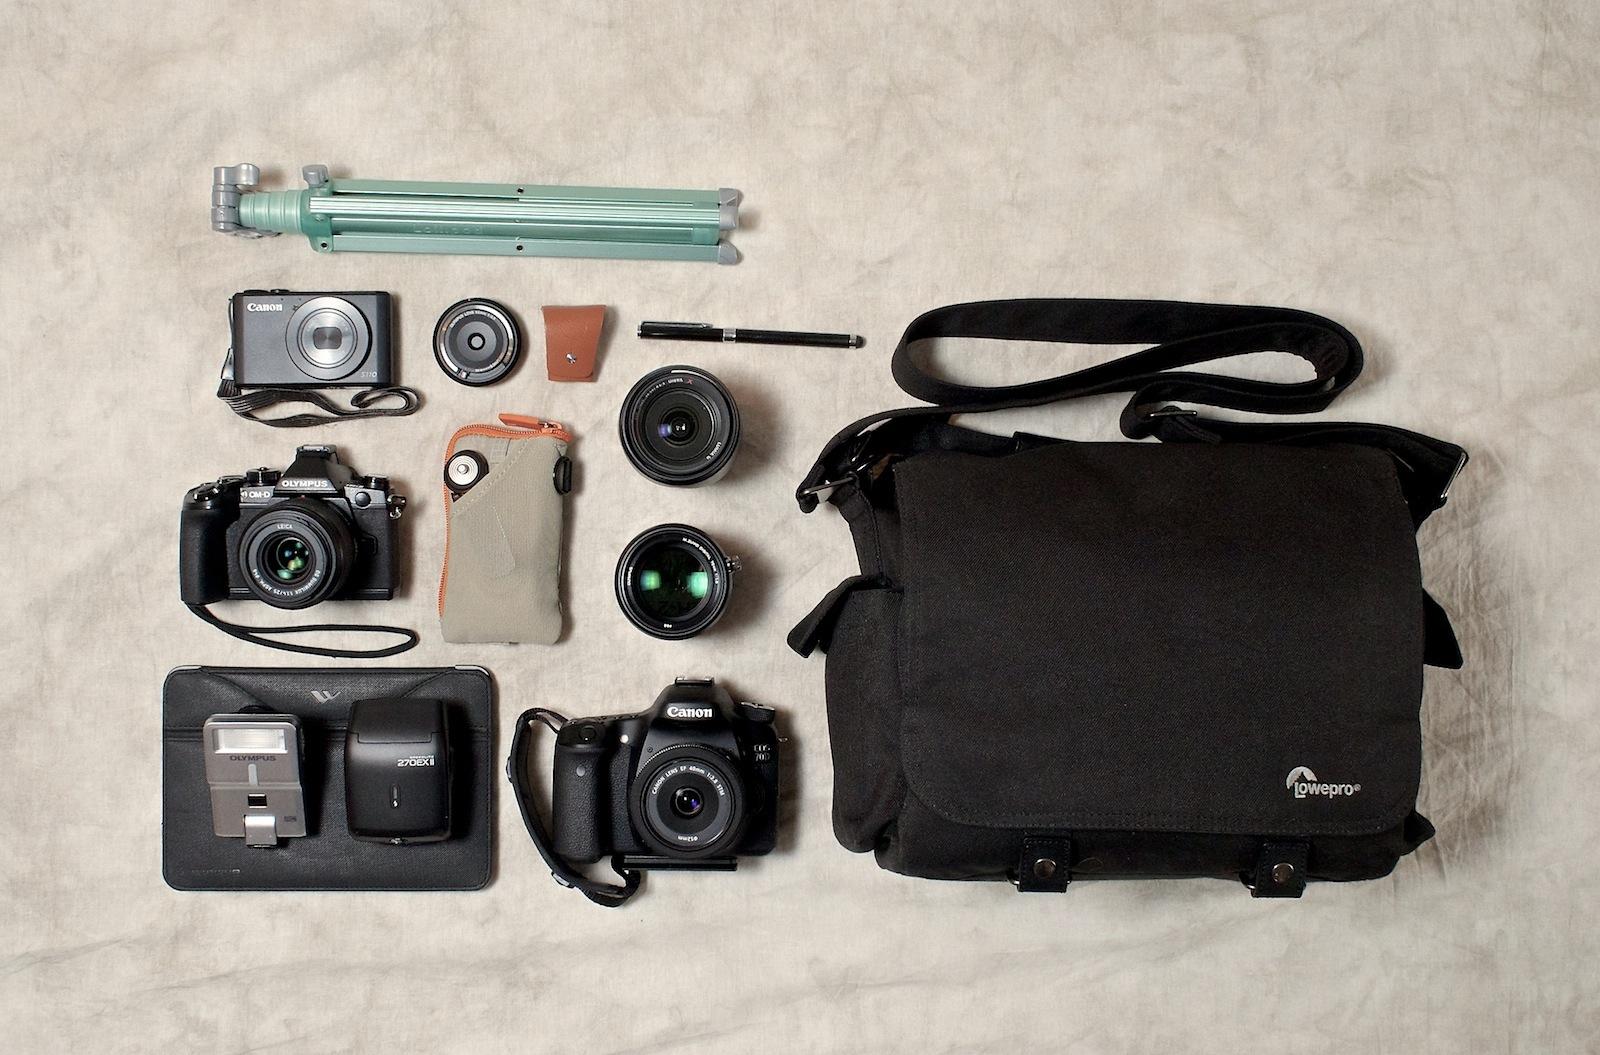 http://thedigitalstory.com/2014/01/17/Derrick-Story-Fit-Kit-E-M1-1600.jpg